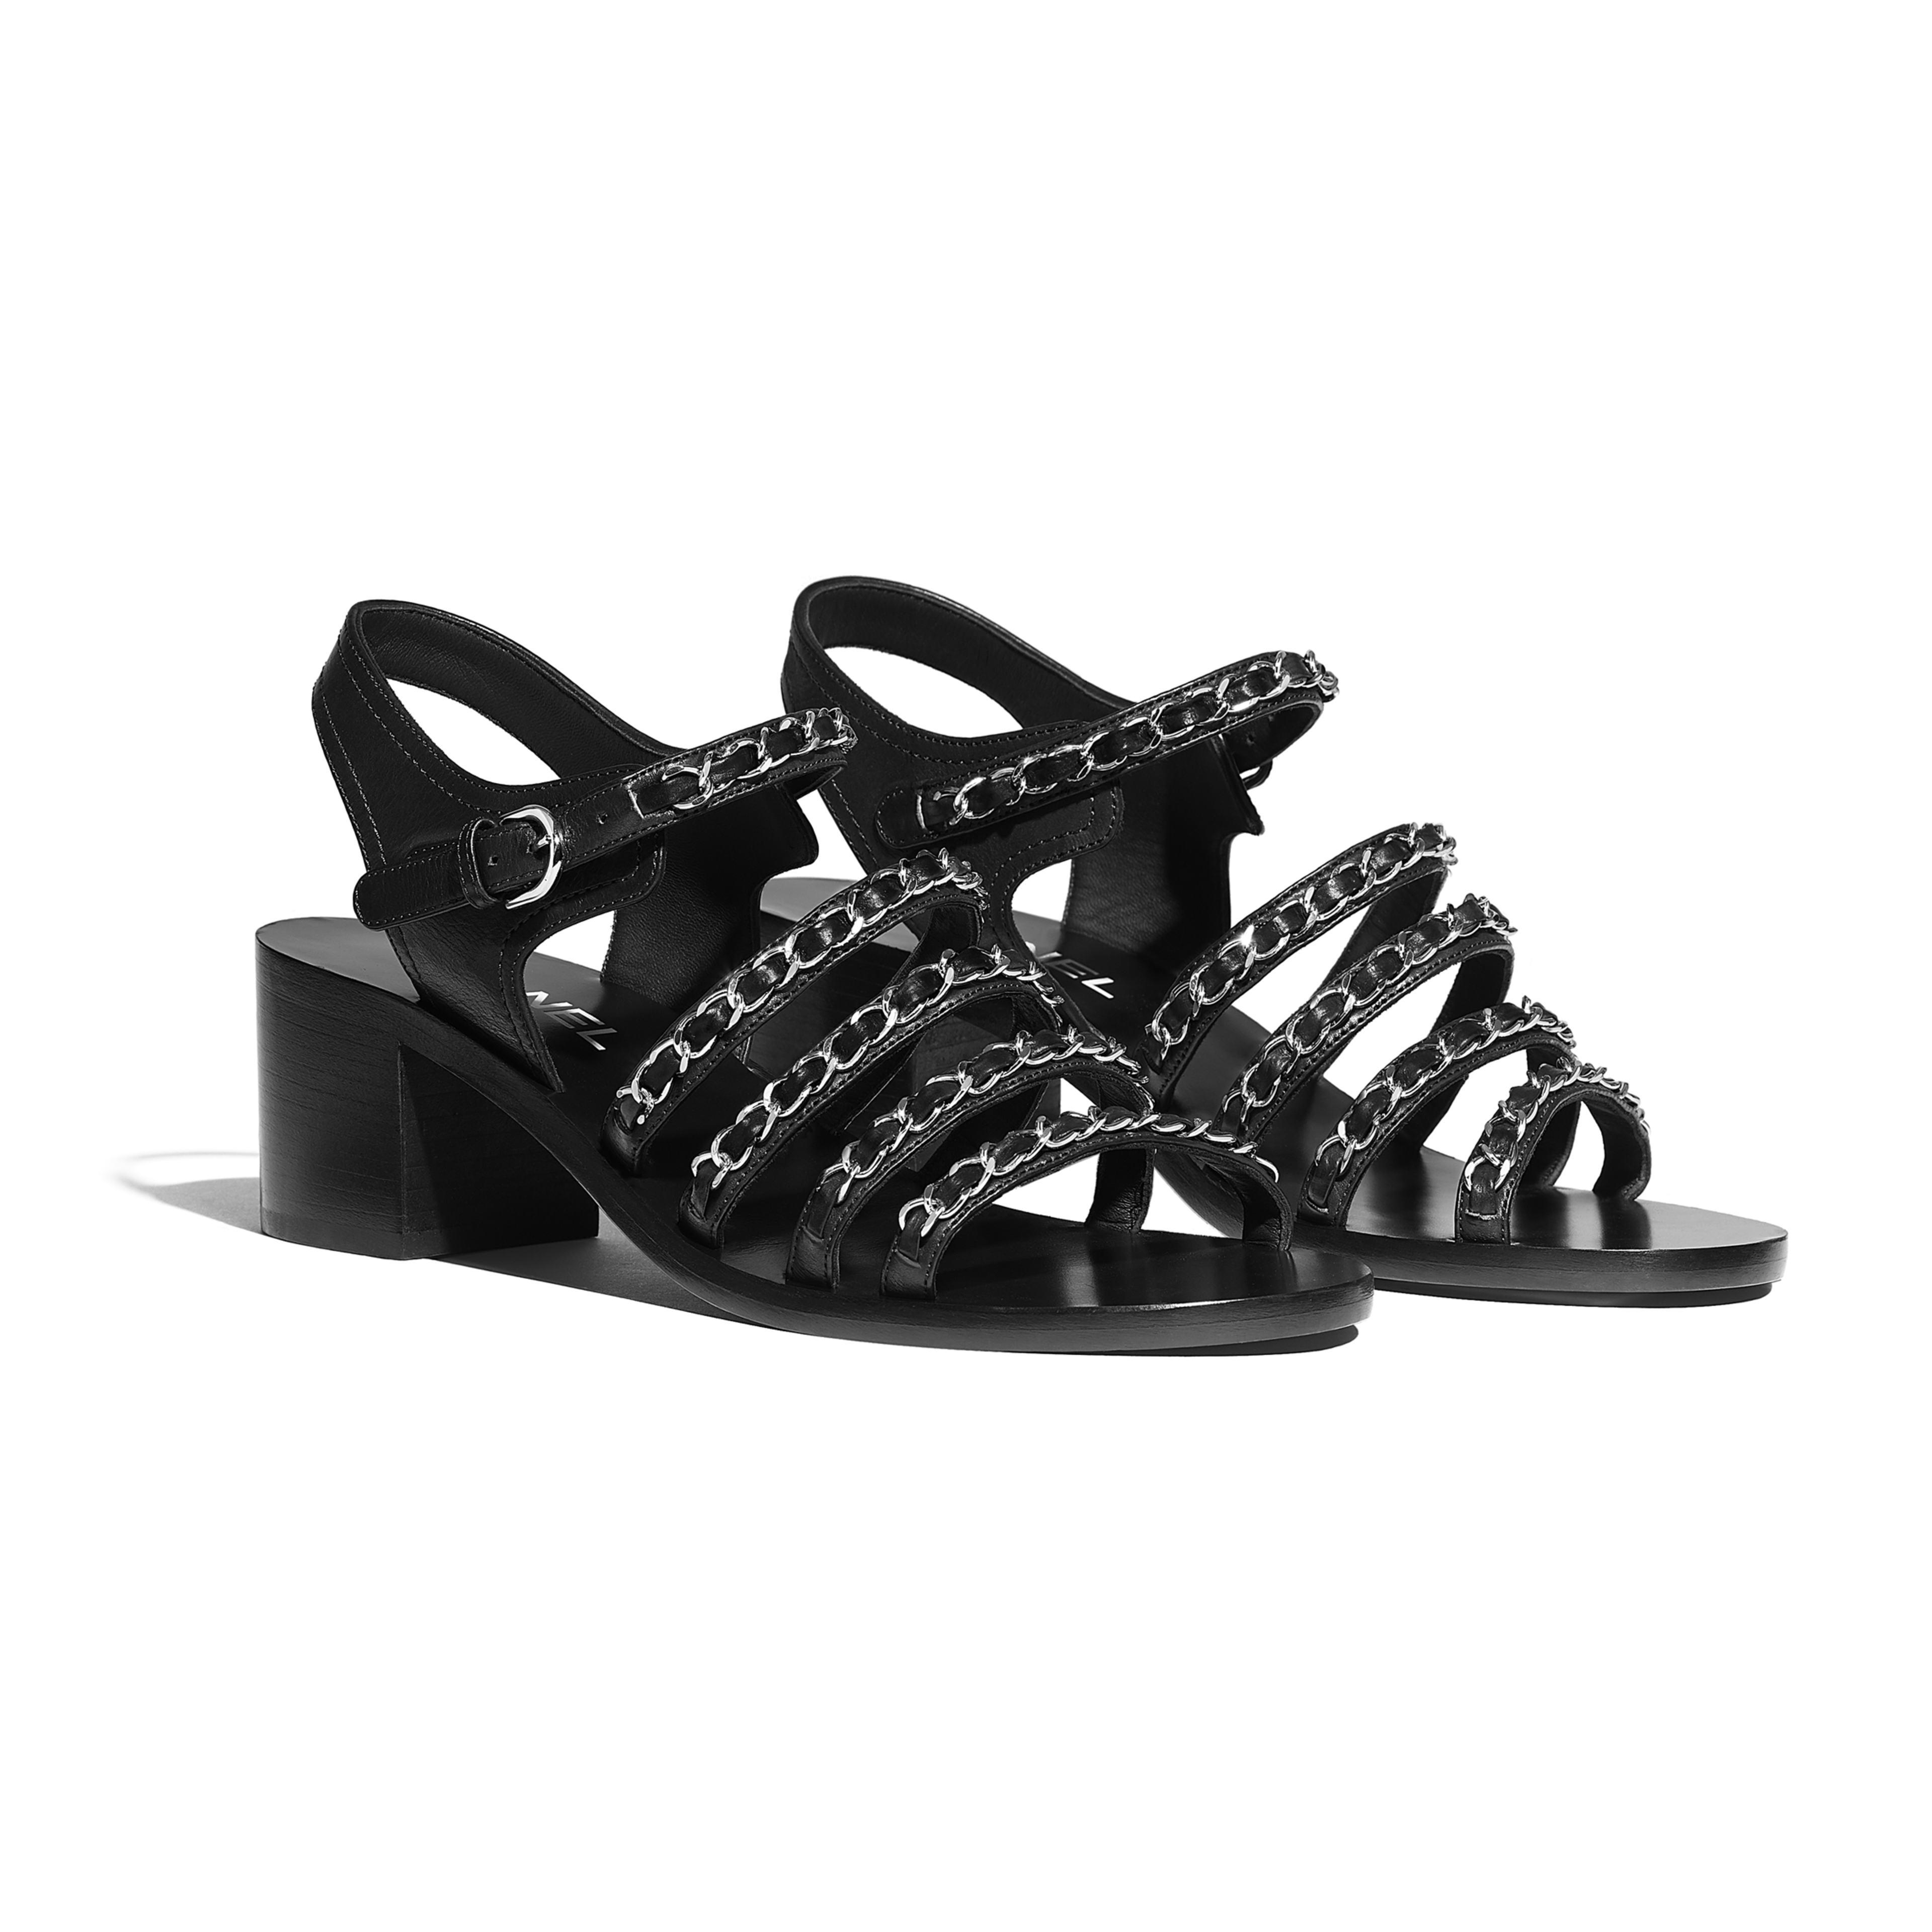 Sandals - Black - Calfskin - Alternative view - see full sized version